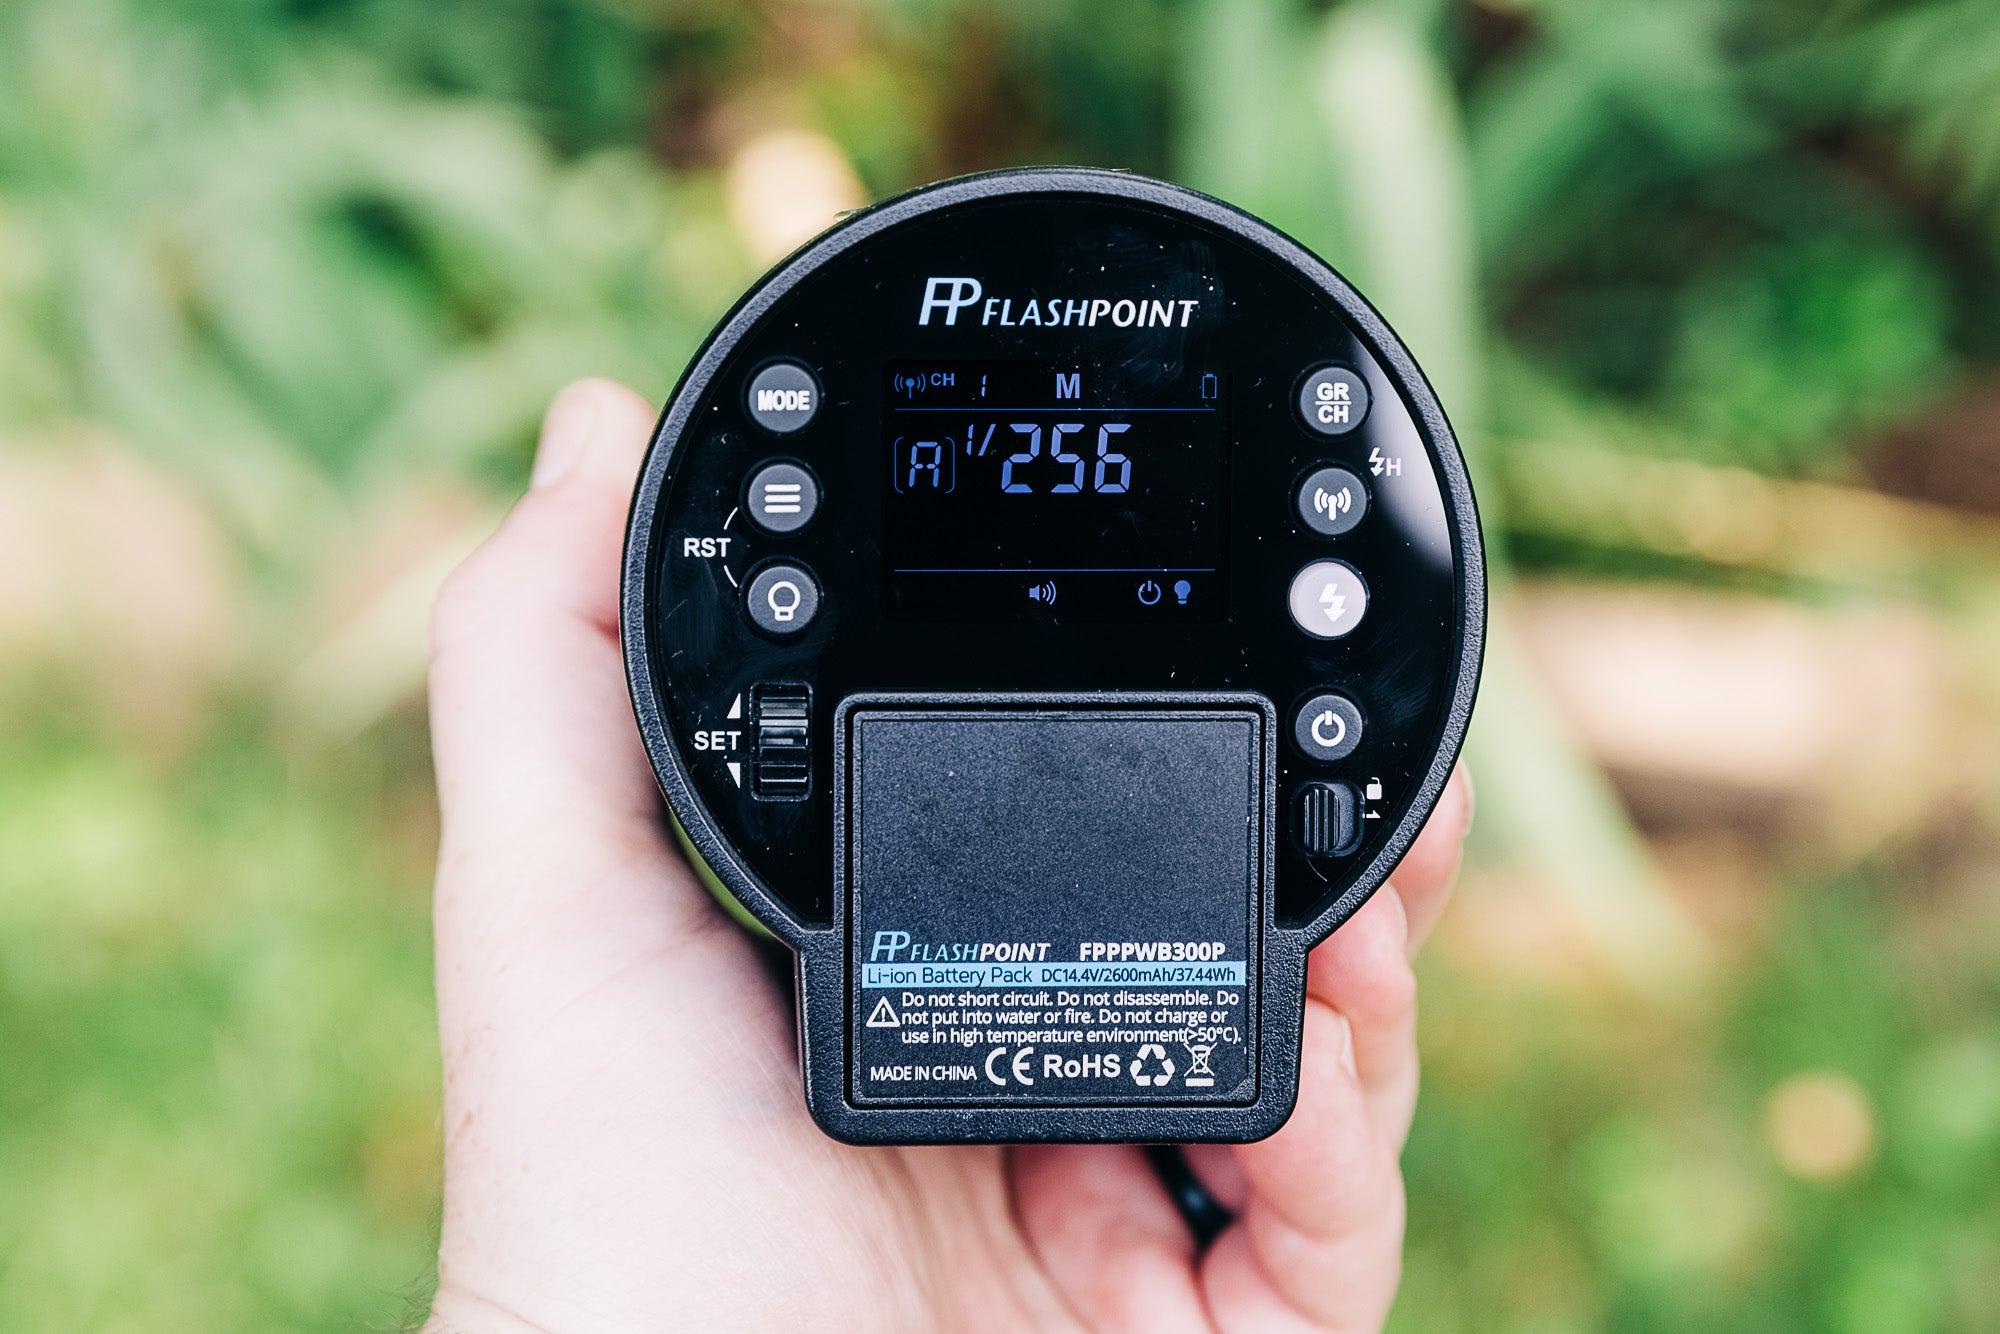 Flashpoint xplor 300 pro ttl r2 back controls